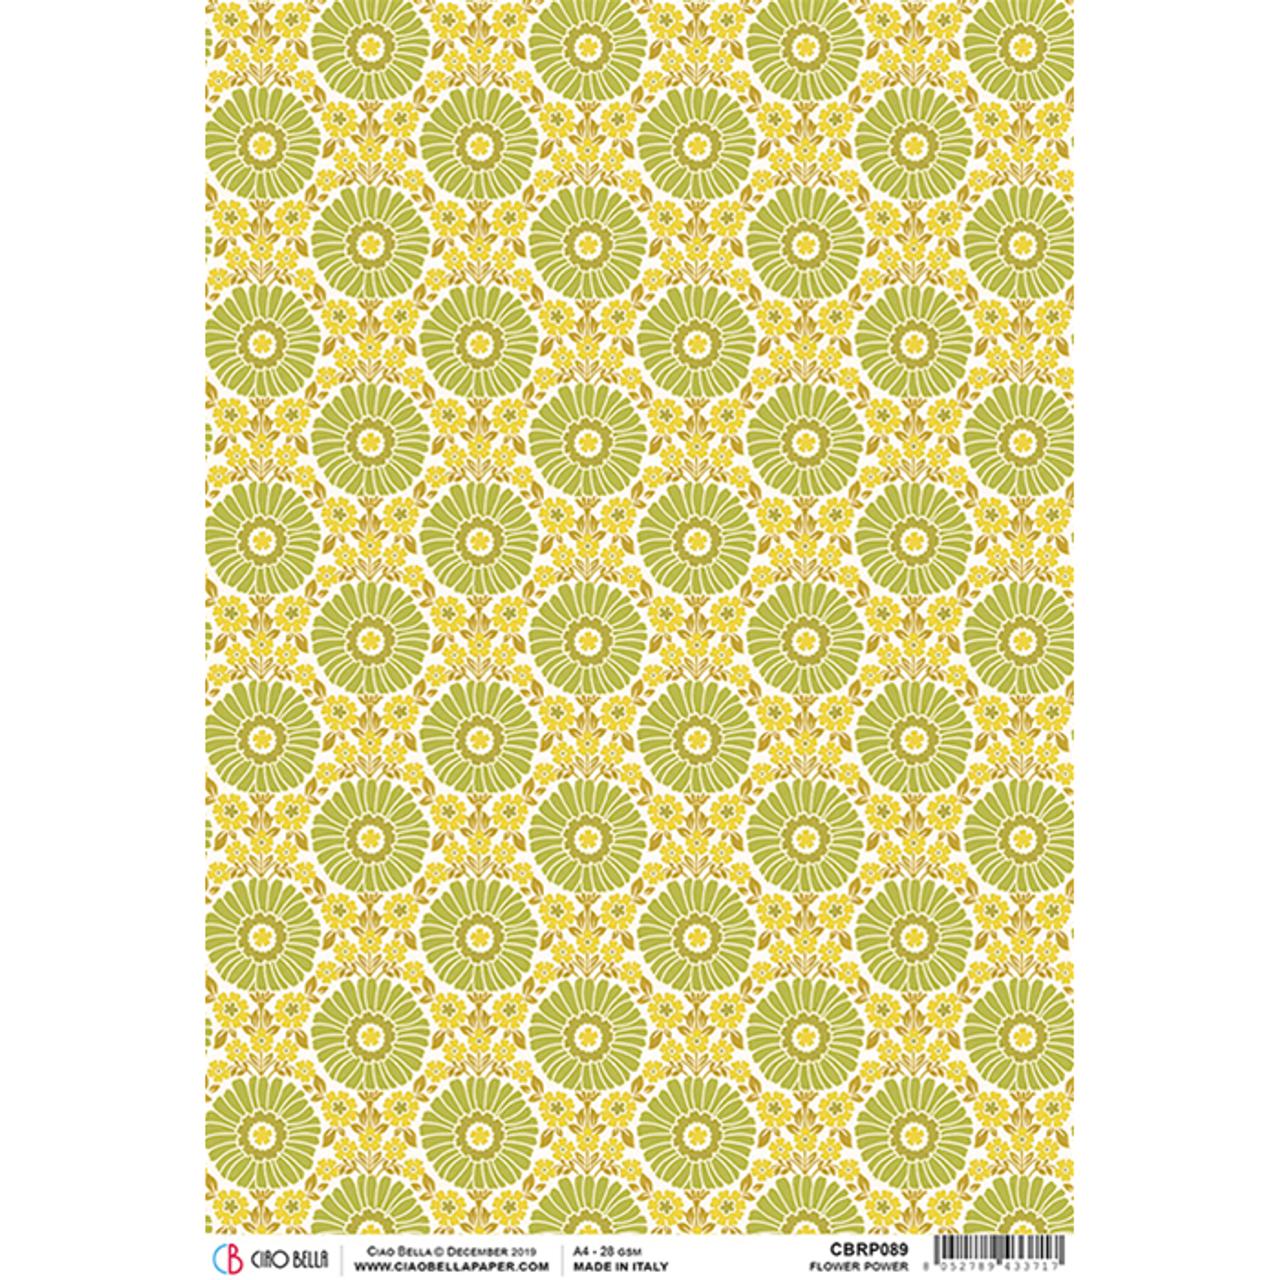 Rice Paper for Decoupage Scrapbook Craft Sheet Tango